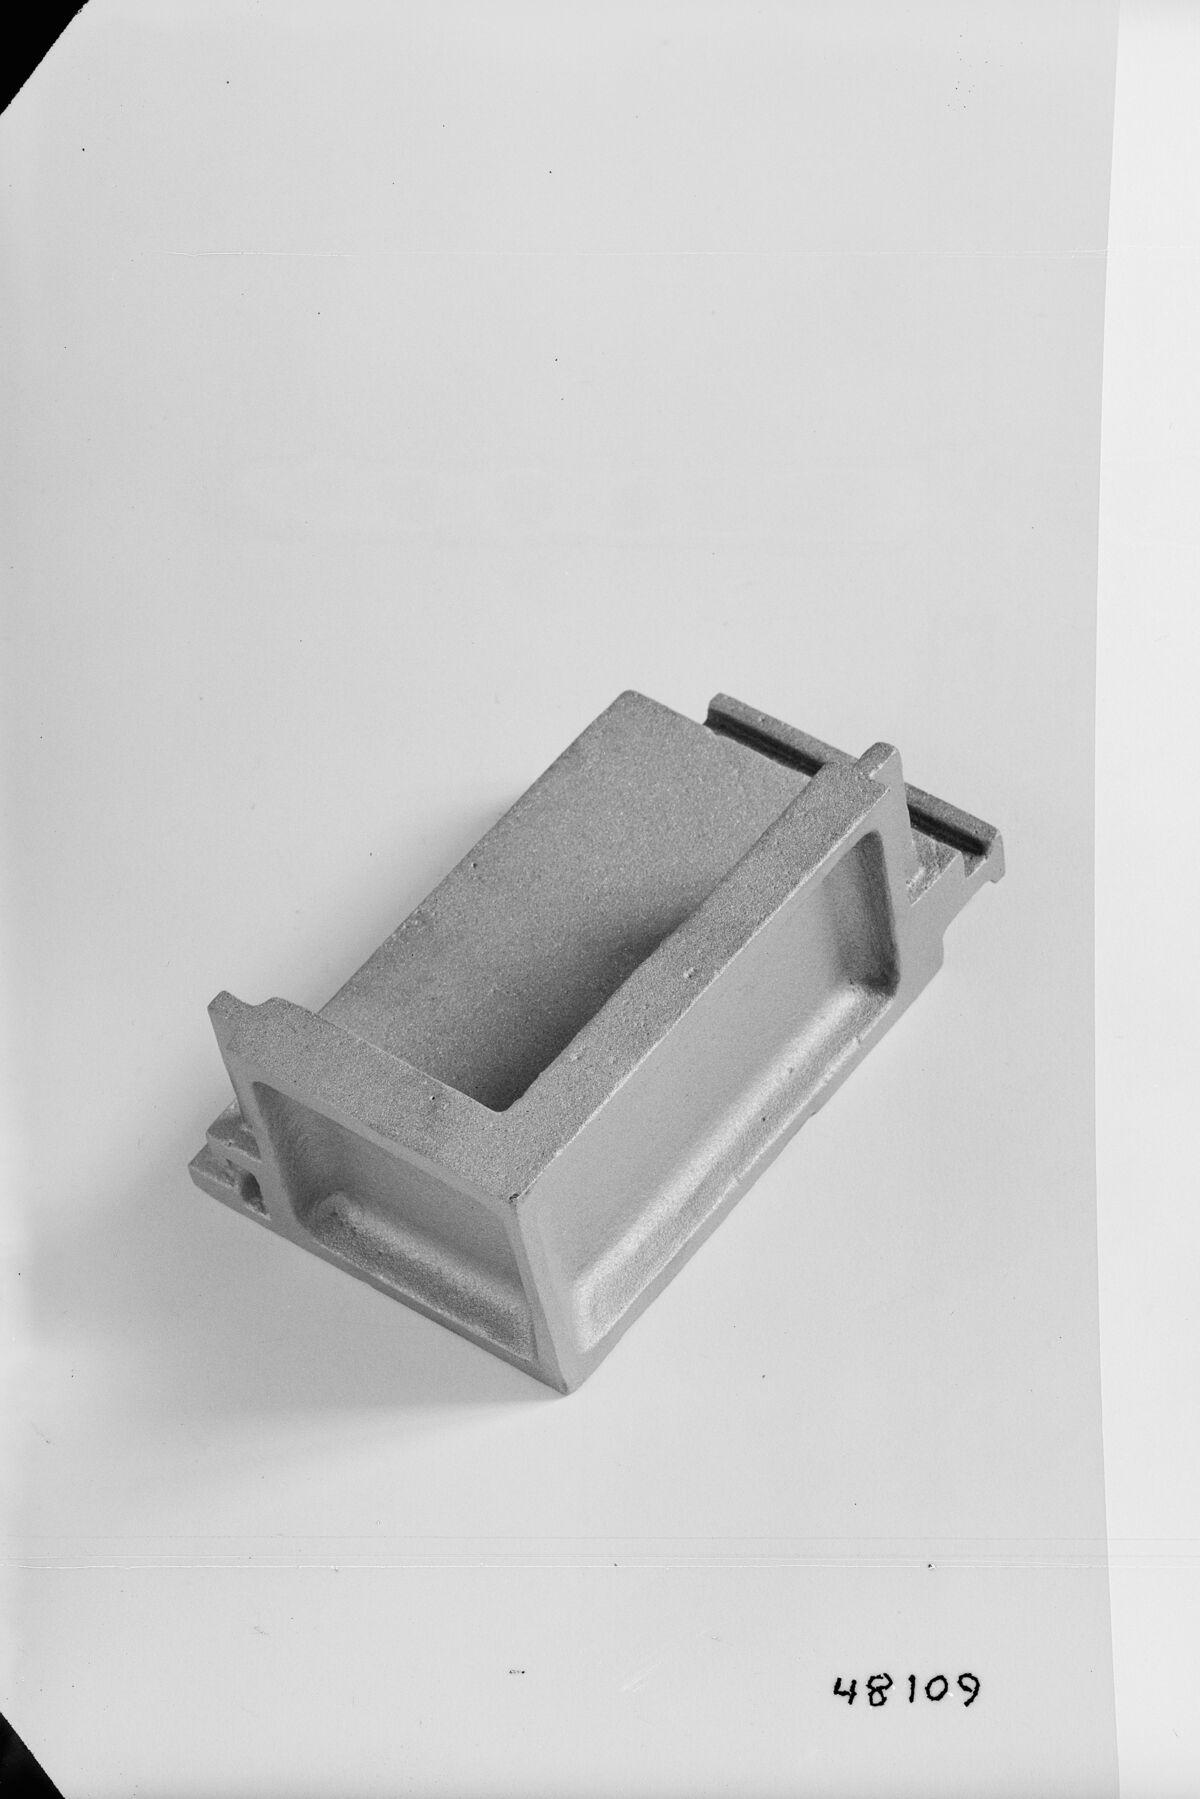 GFA 16/48109: Flooring for Borel annealing furnaces